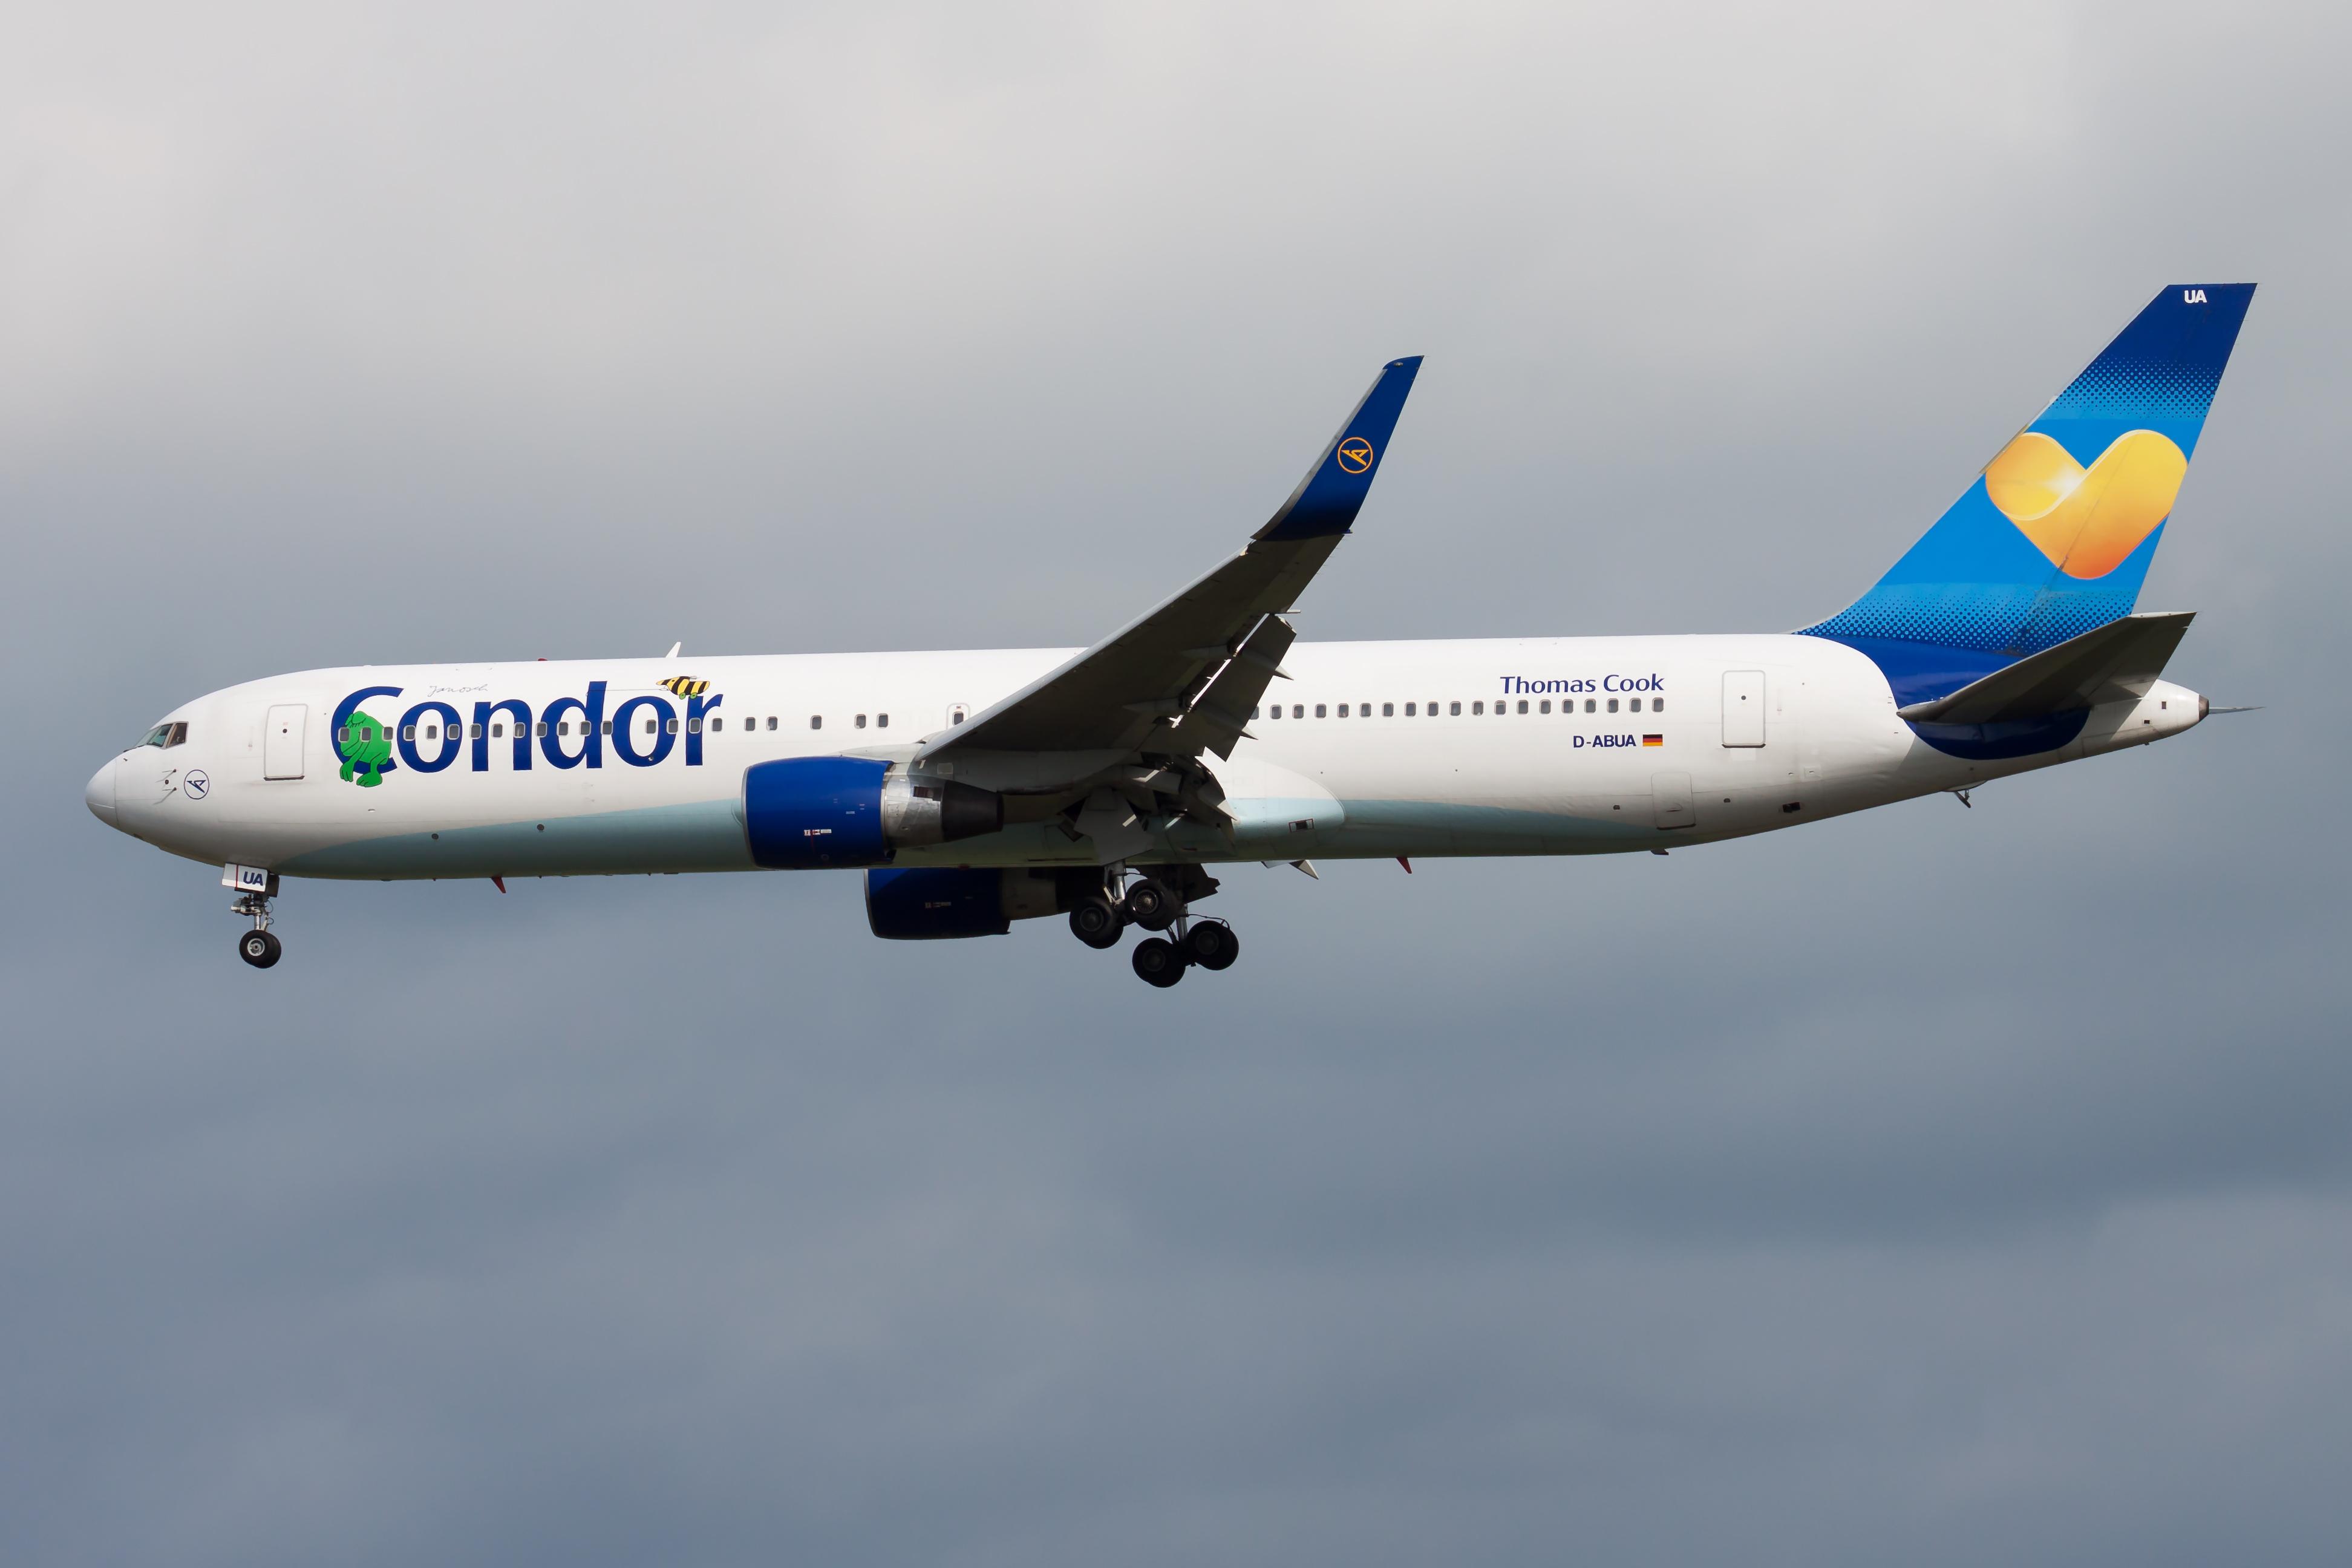 FRANKFURT / GERMANY - AUGUST 17, 2014: Condor Airlines Boeing 767-300 D-ABUA passenger plane landing at Frankfurt airport